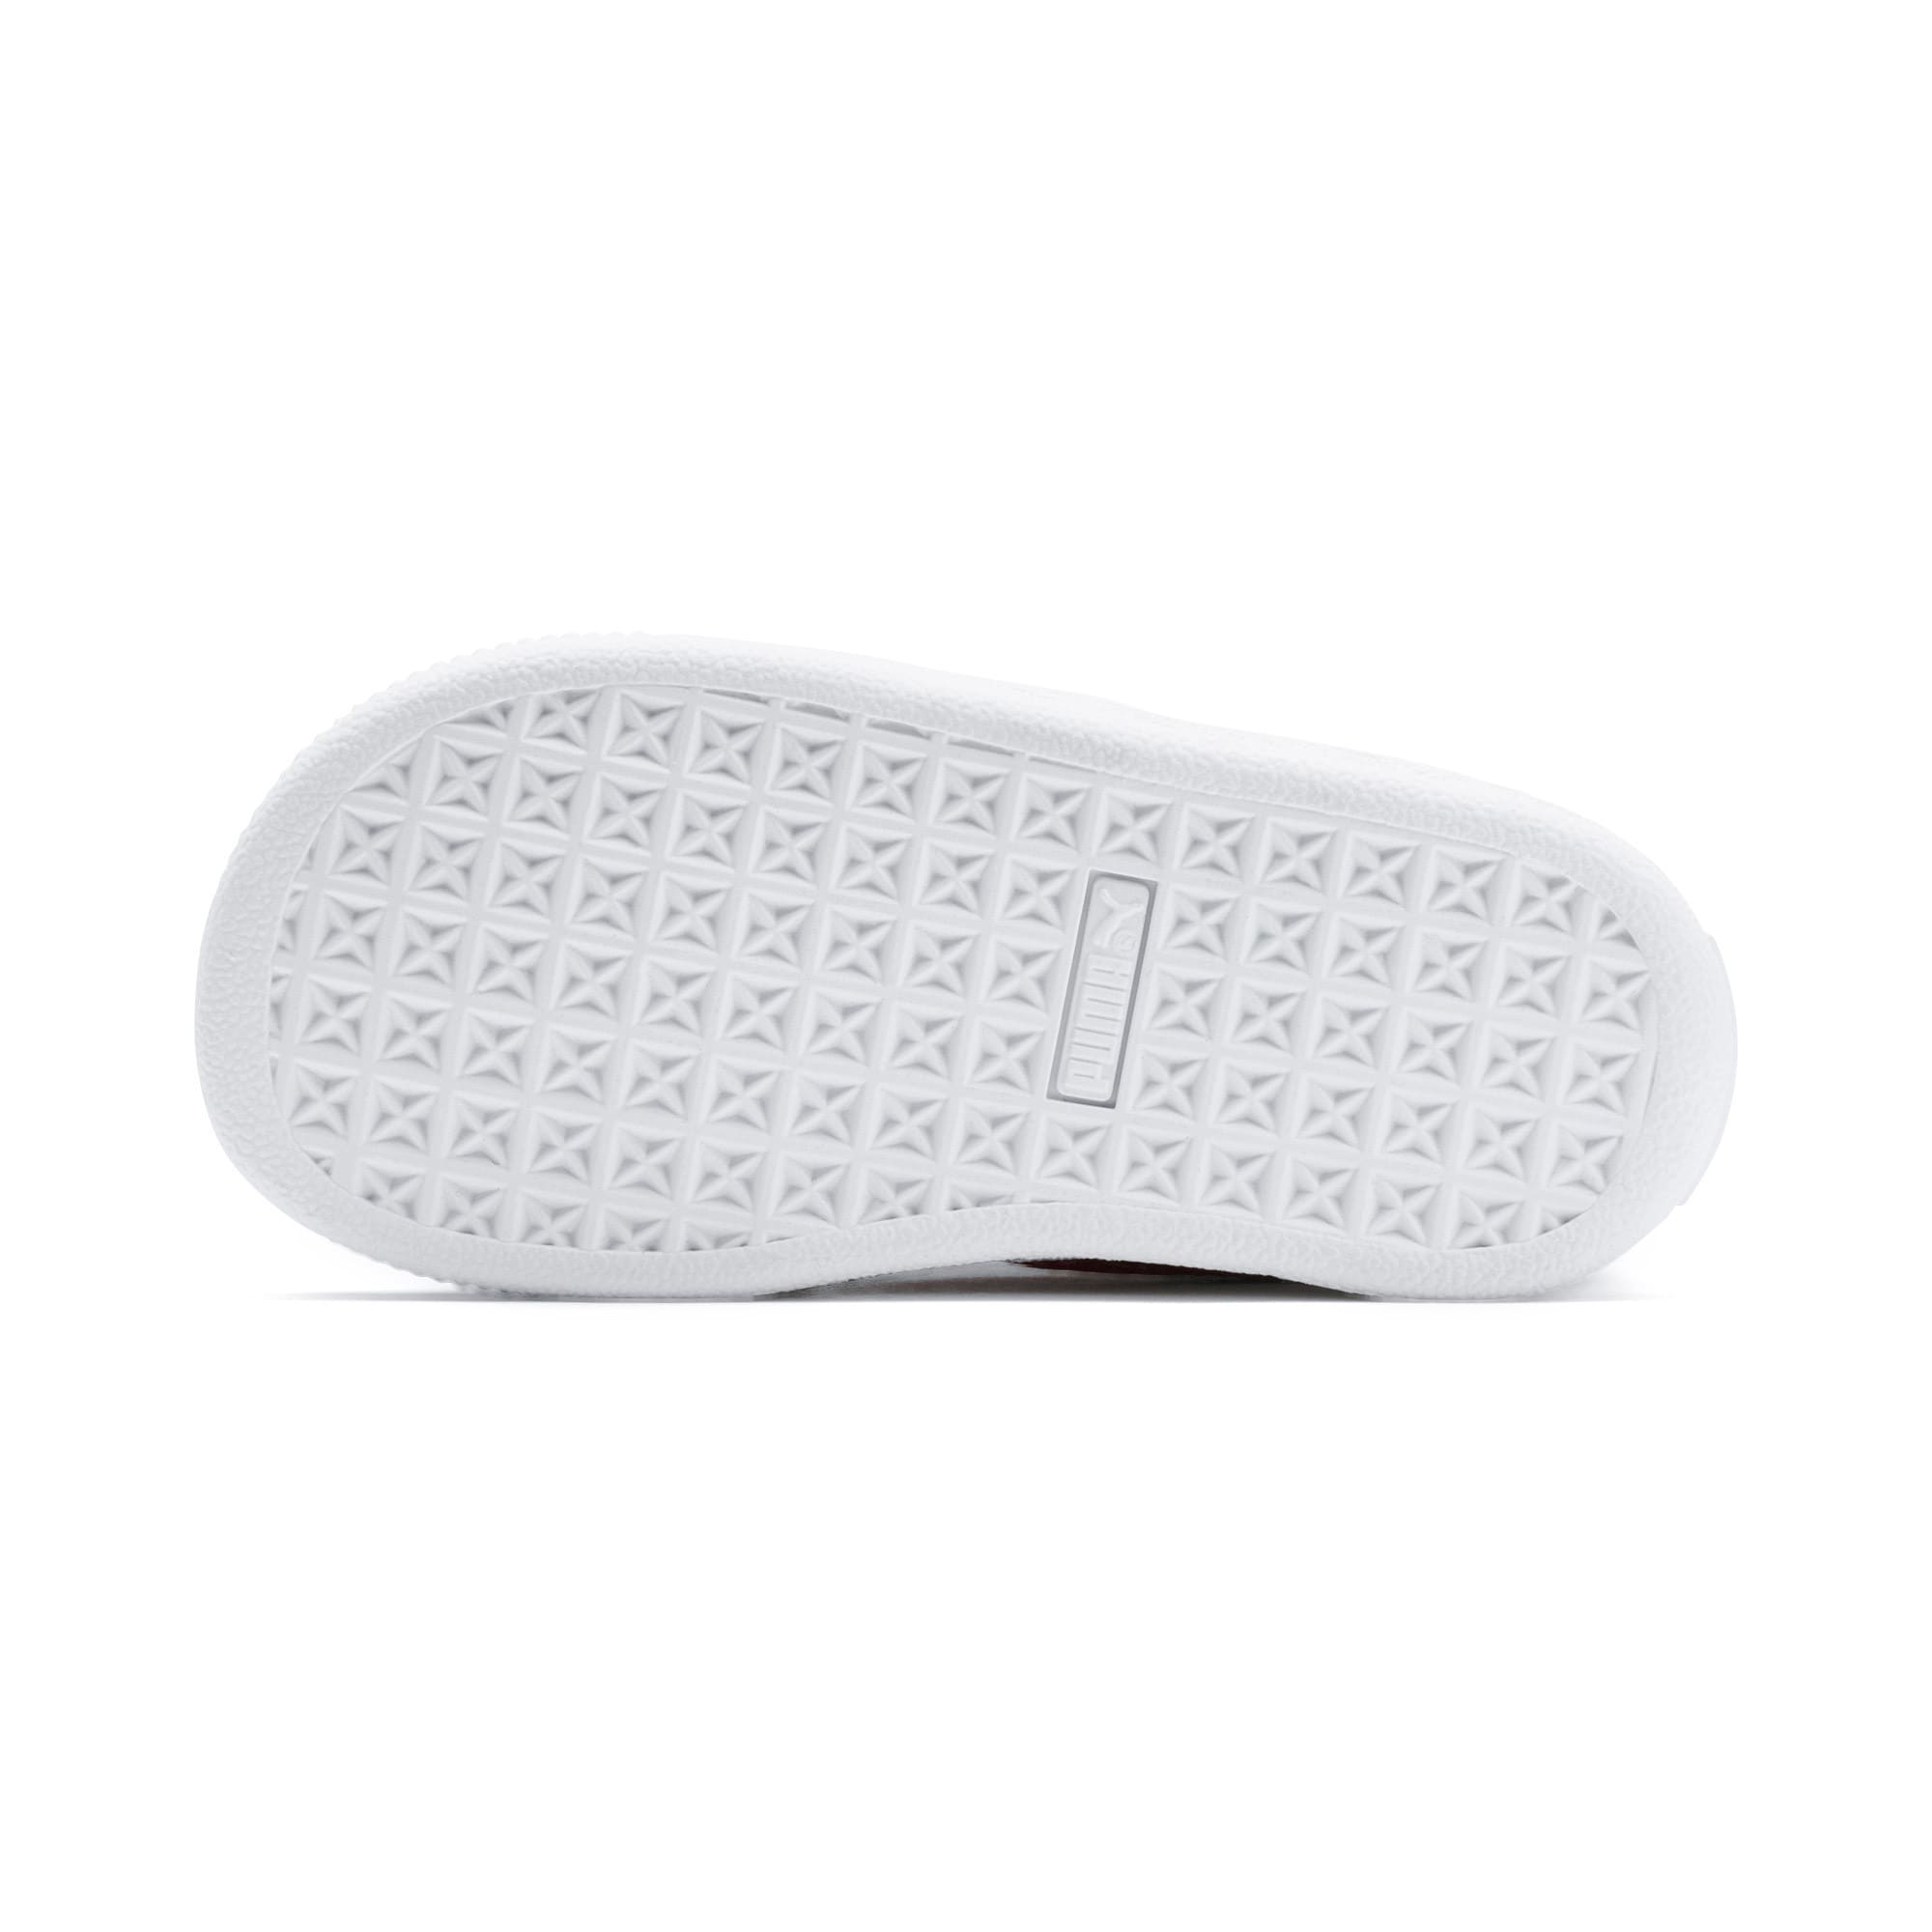 Thumbnail 4 of PUMA x SOPHIA WEBSTER Basket Toddler Shoes, Puma White-Pale Pink, medium